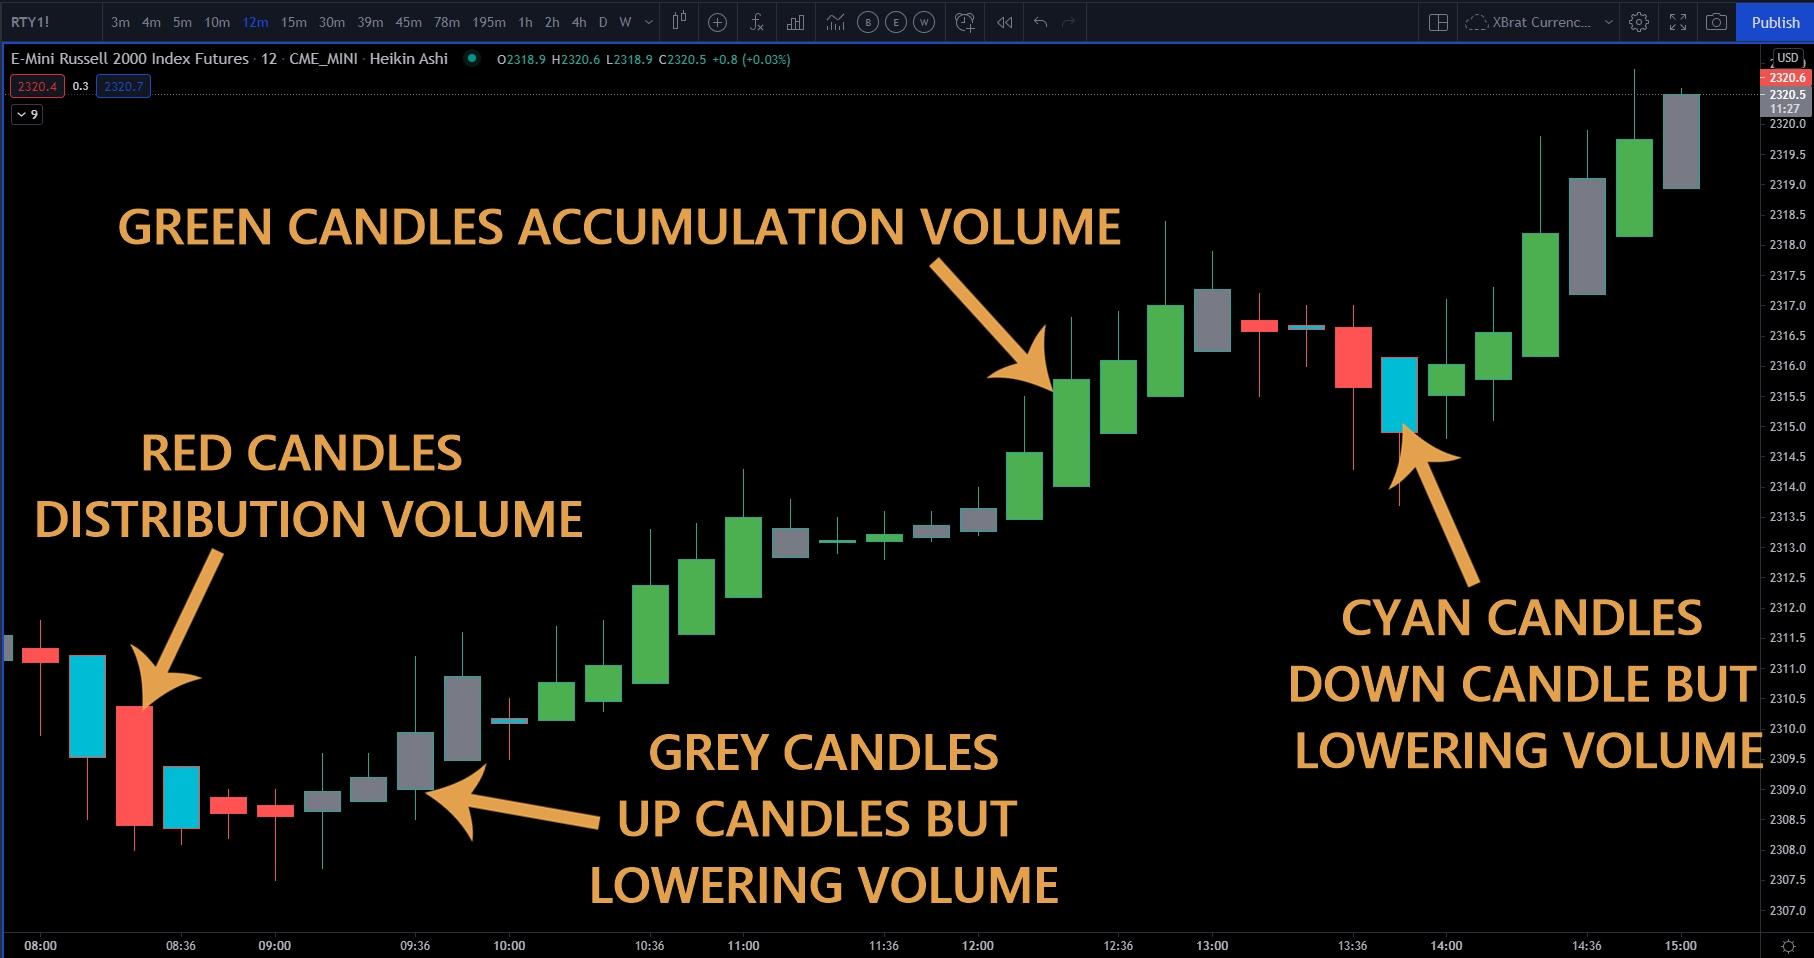 Volume Behavior For TradingView